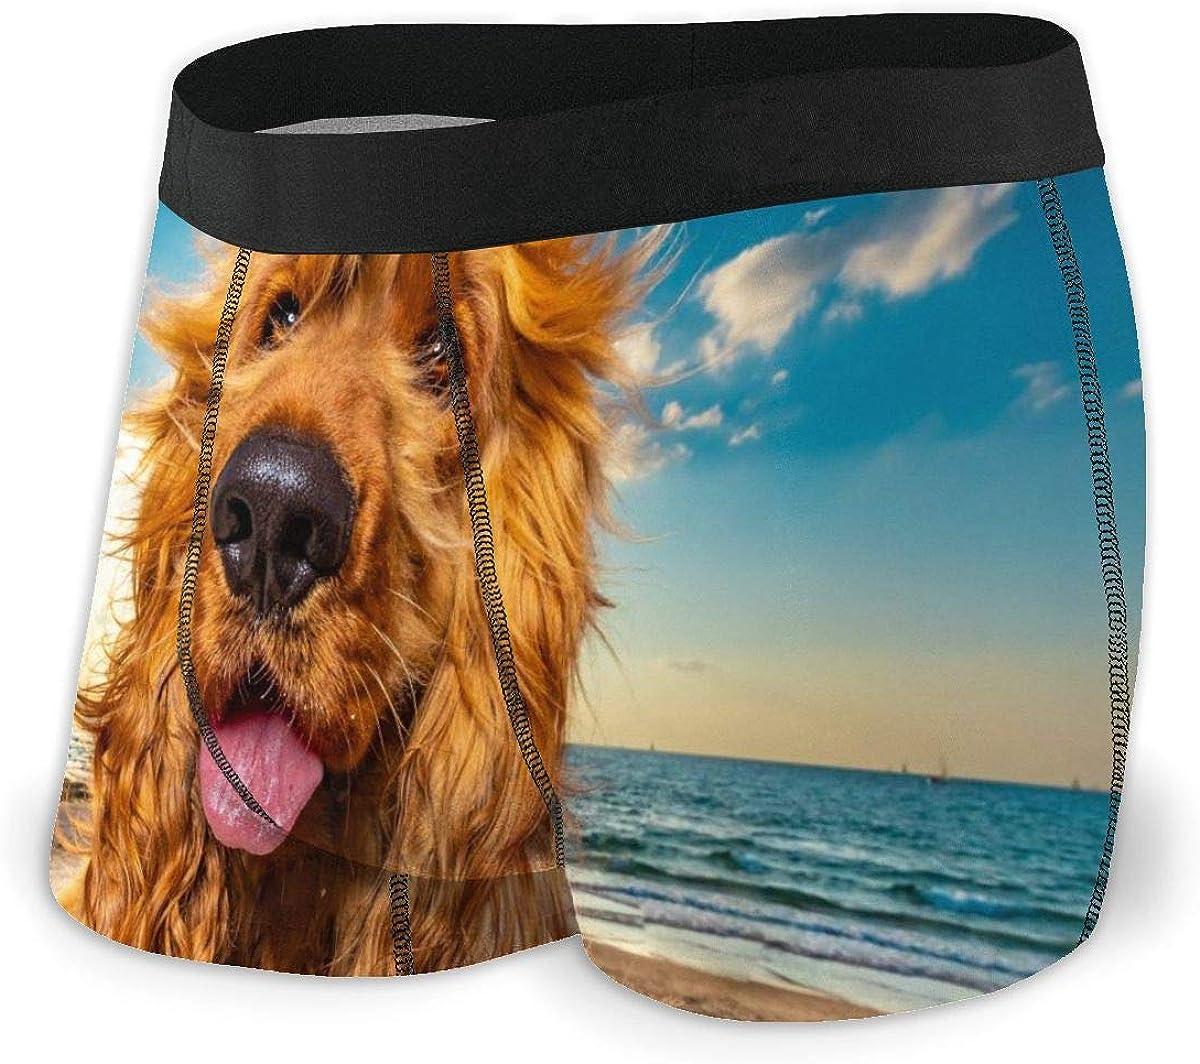 Mens Boxer Briefs Cute Funny Golden Retriever Dog Bikini Underwear Stretch Low Rise Trunks Boys Underpants